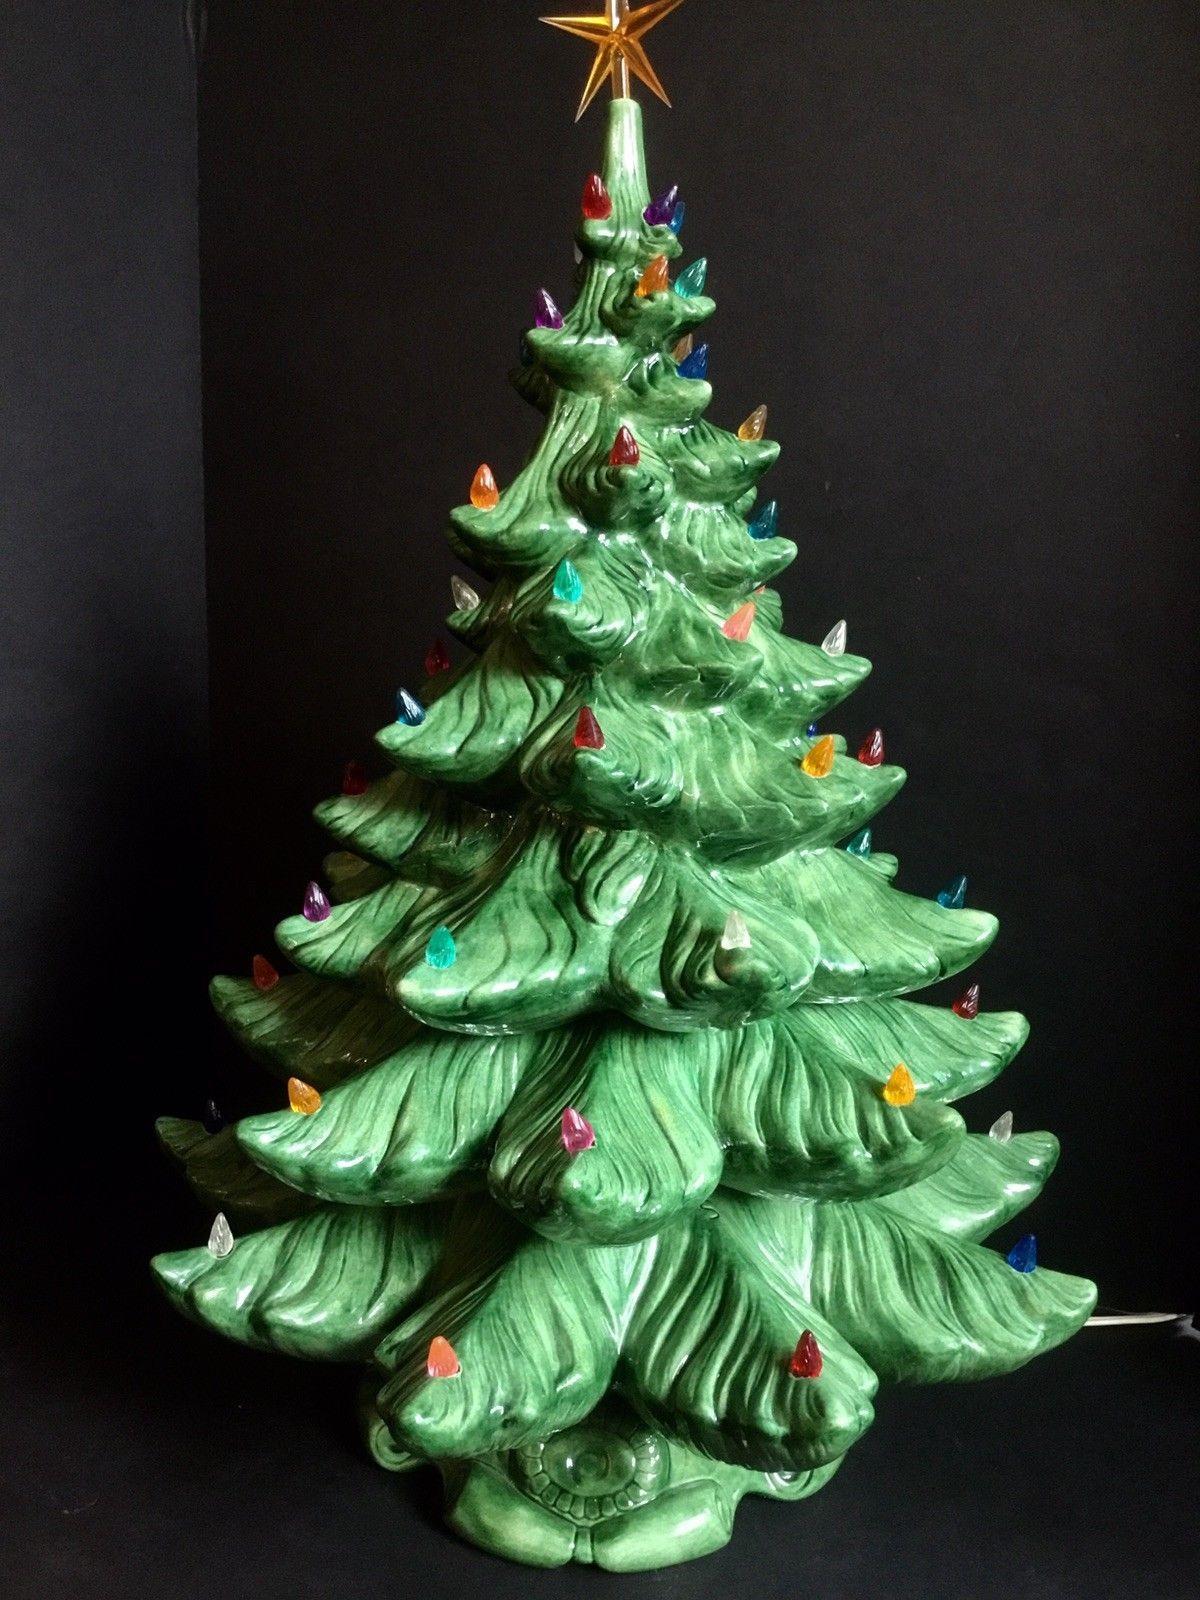 Vtg Ceramic Lighted Christmas Tree Music Box 4pc 25 Atlantic Mold Artifi Christmas Tree Music Box Ceramic Christmas Tree Lights Vintage Ceramic Christmas Tree